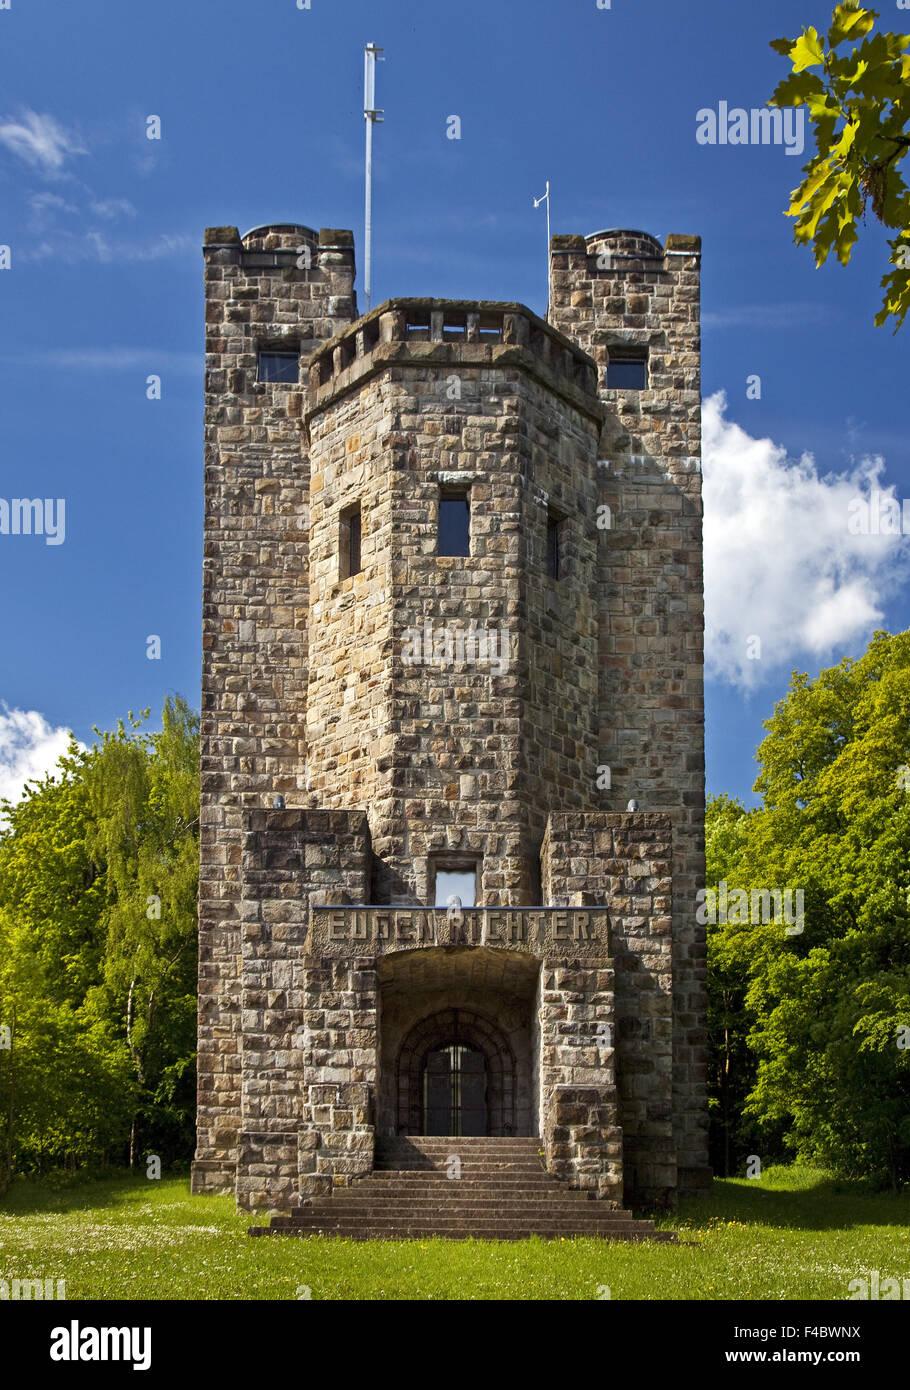 Eugen Richter Tower, Hagen, Germany - Stock Image